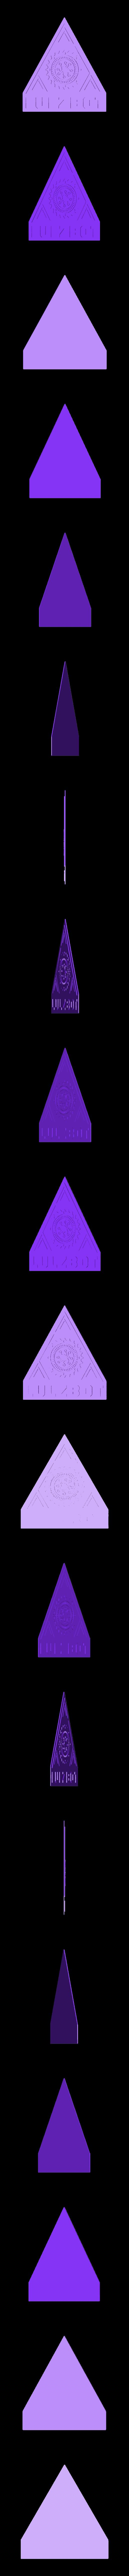 Lulzbot_logo_4_layers.stl Download free STL file Lulzbot Logo Layered for Single/Dual Extrusion • 3D print template, joshcarter